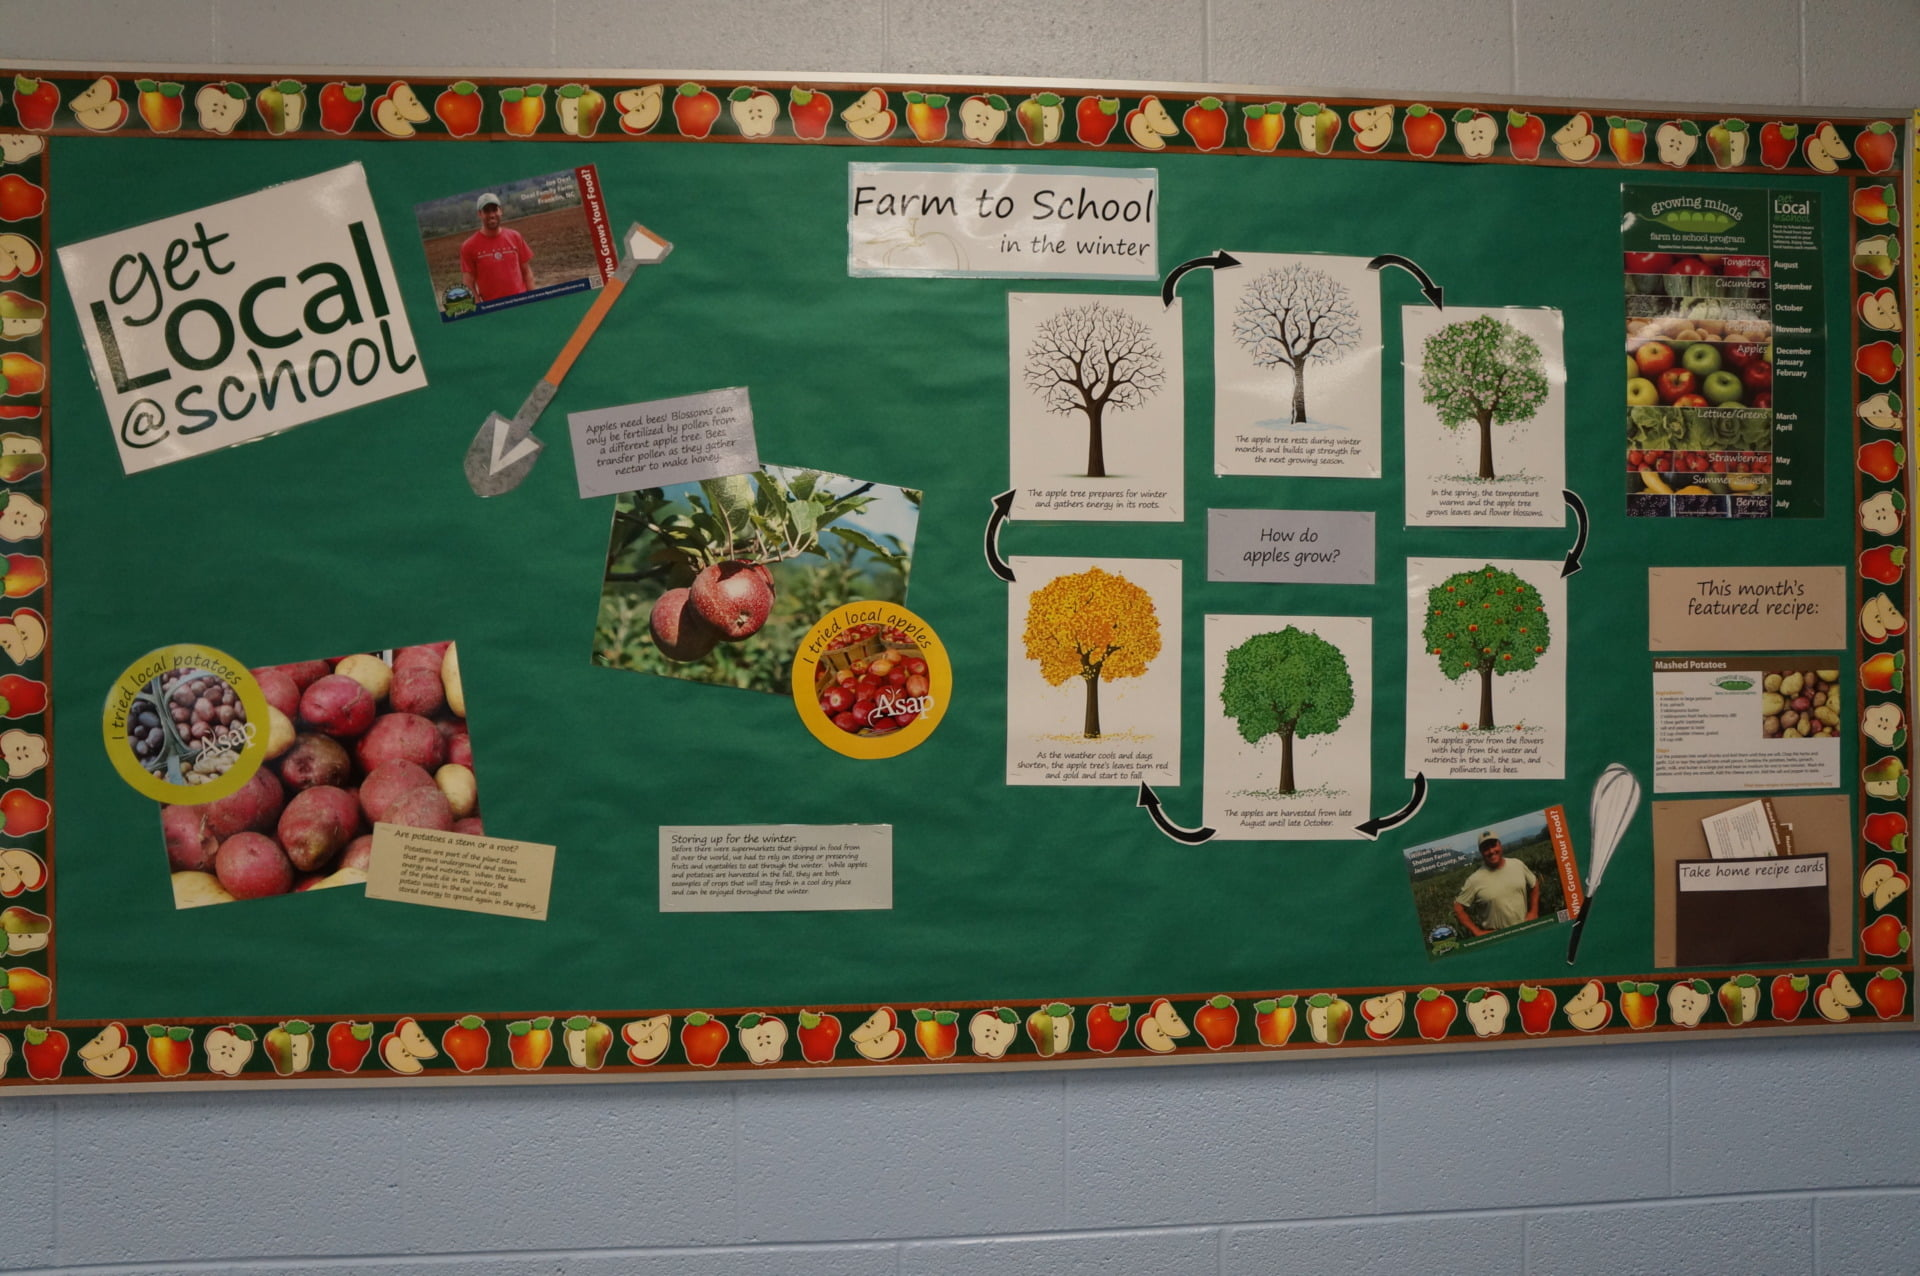 Get Local School Bulletin Board